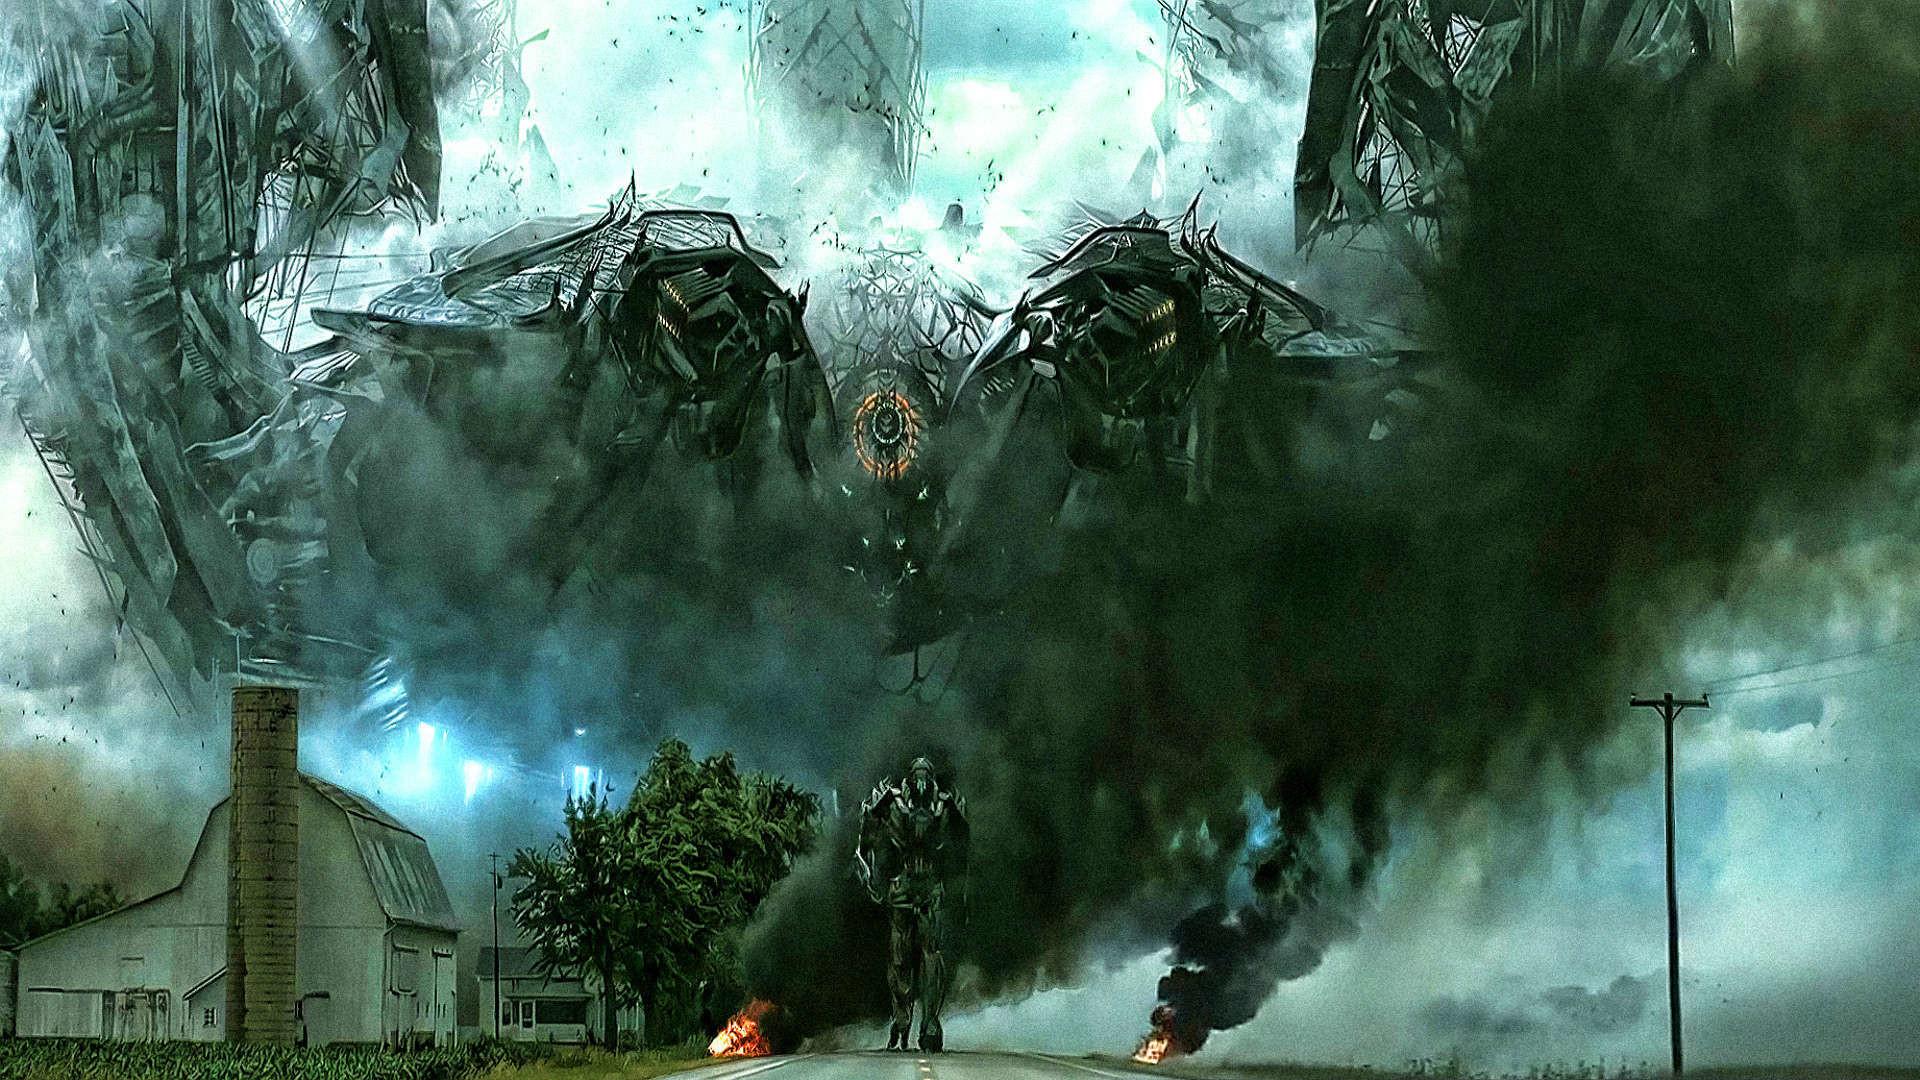 Transformers-4-lockdown-Wallpaper-1080p-full-hd-wallpaper